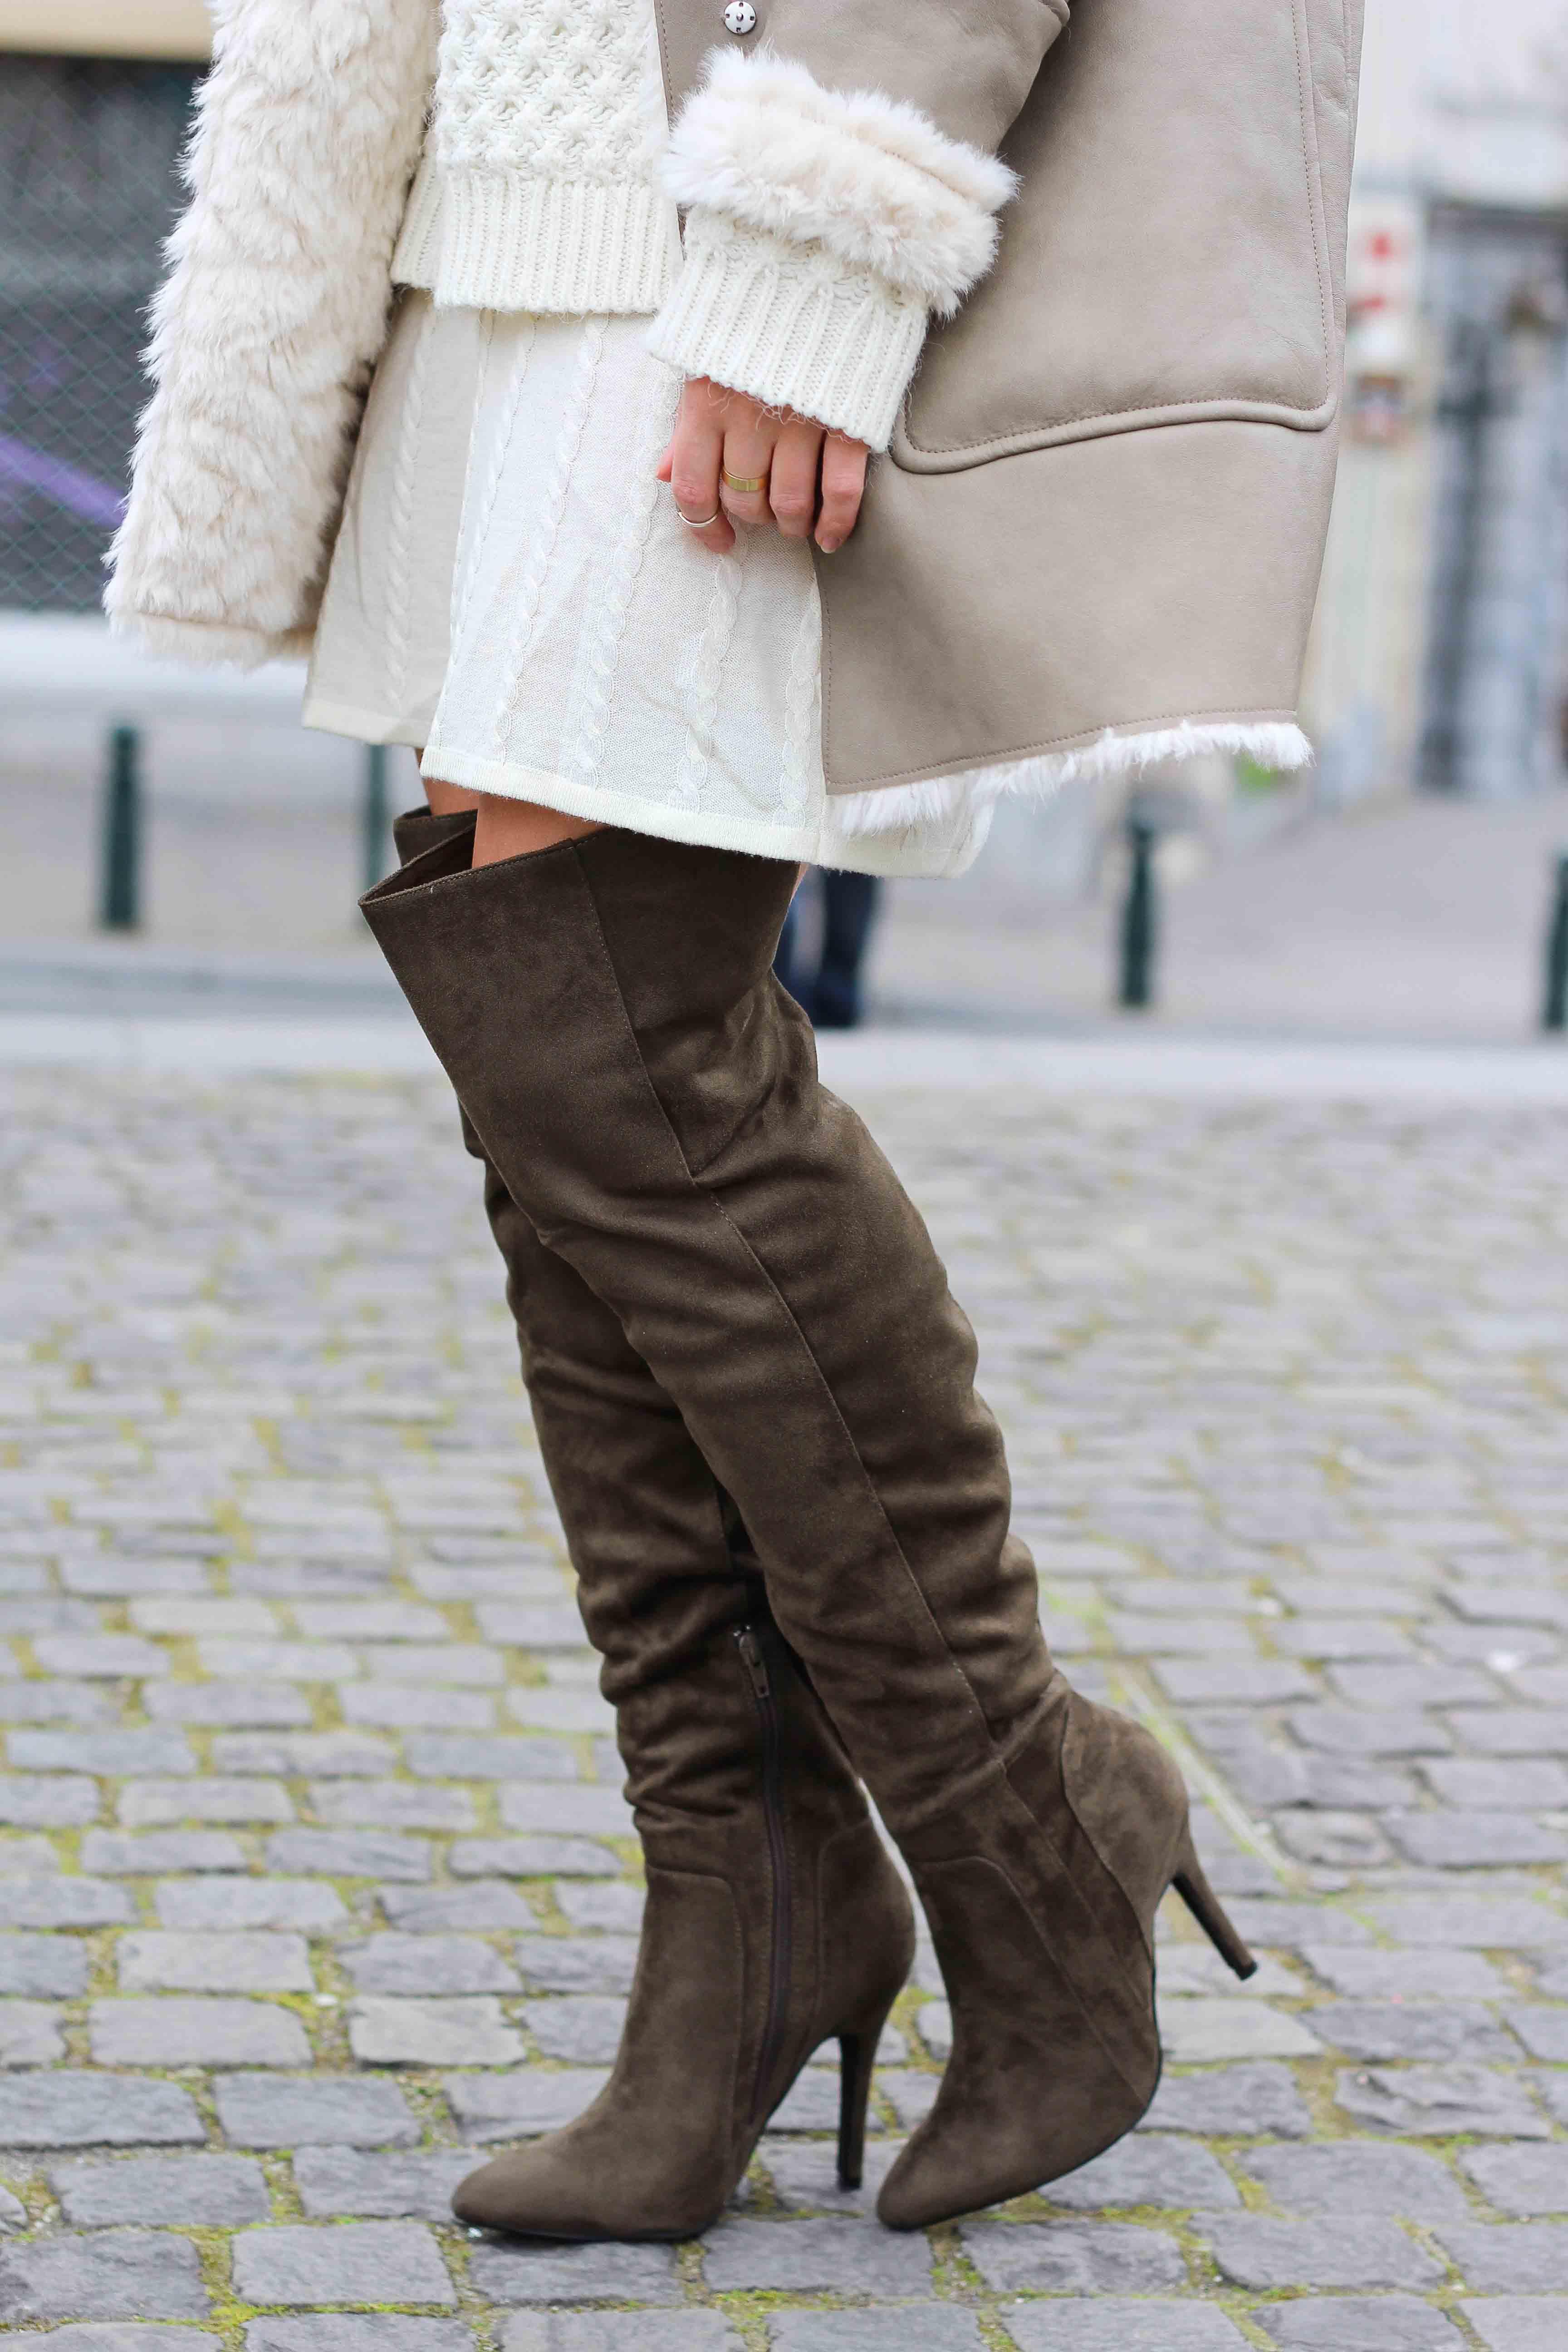 Kleid zu overknee stiefel